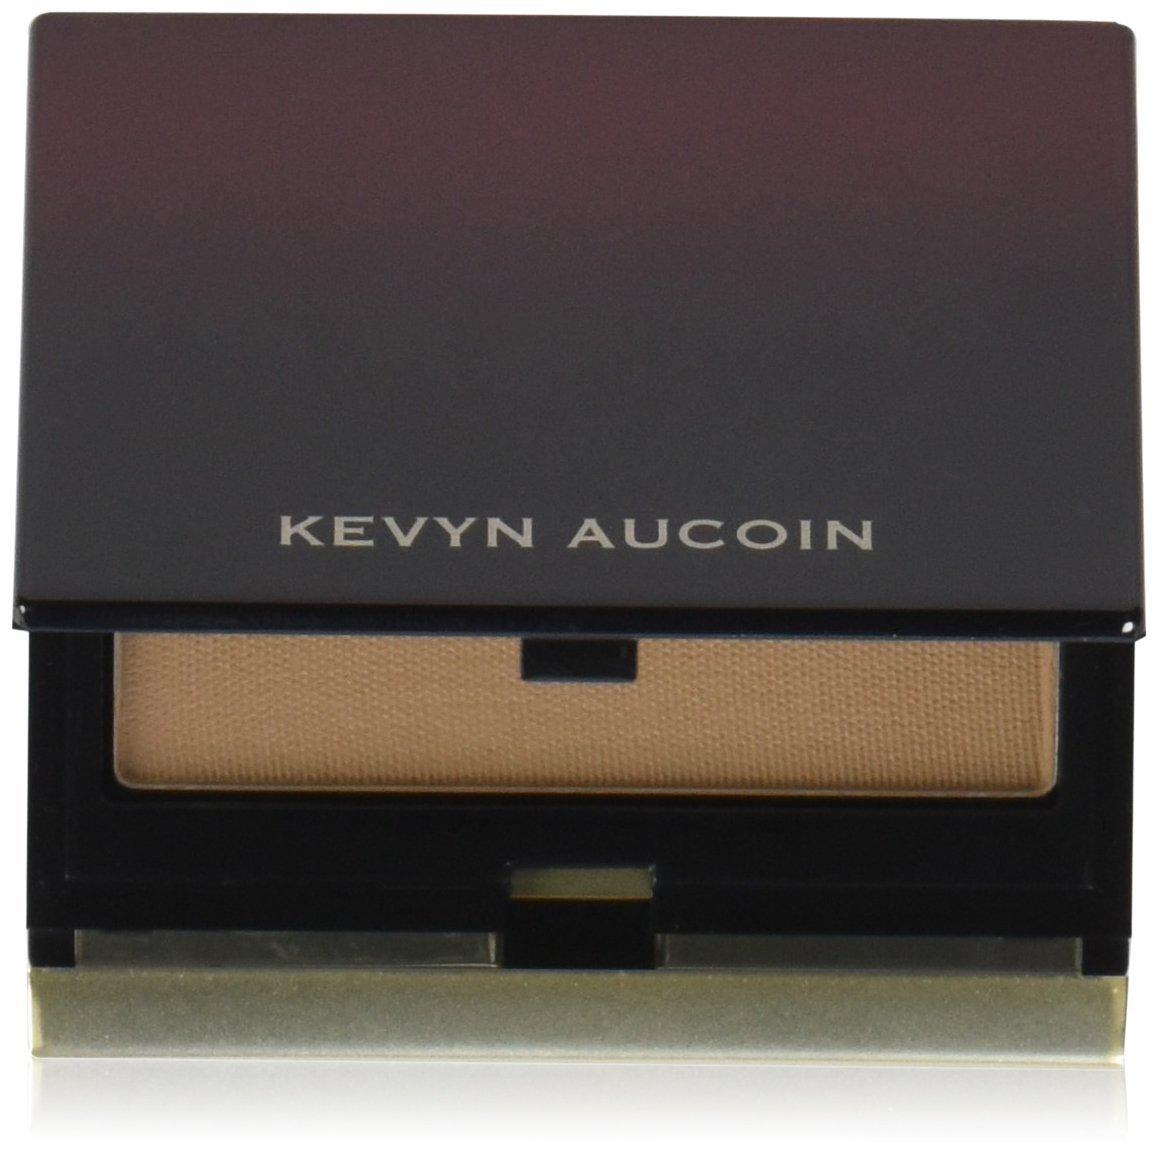 Kevyn Aucoin The Sculpting Powder (New Packaging), Medium, 0.11 Ounce